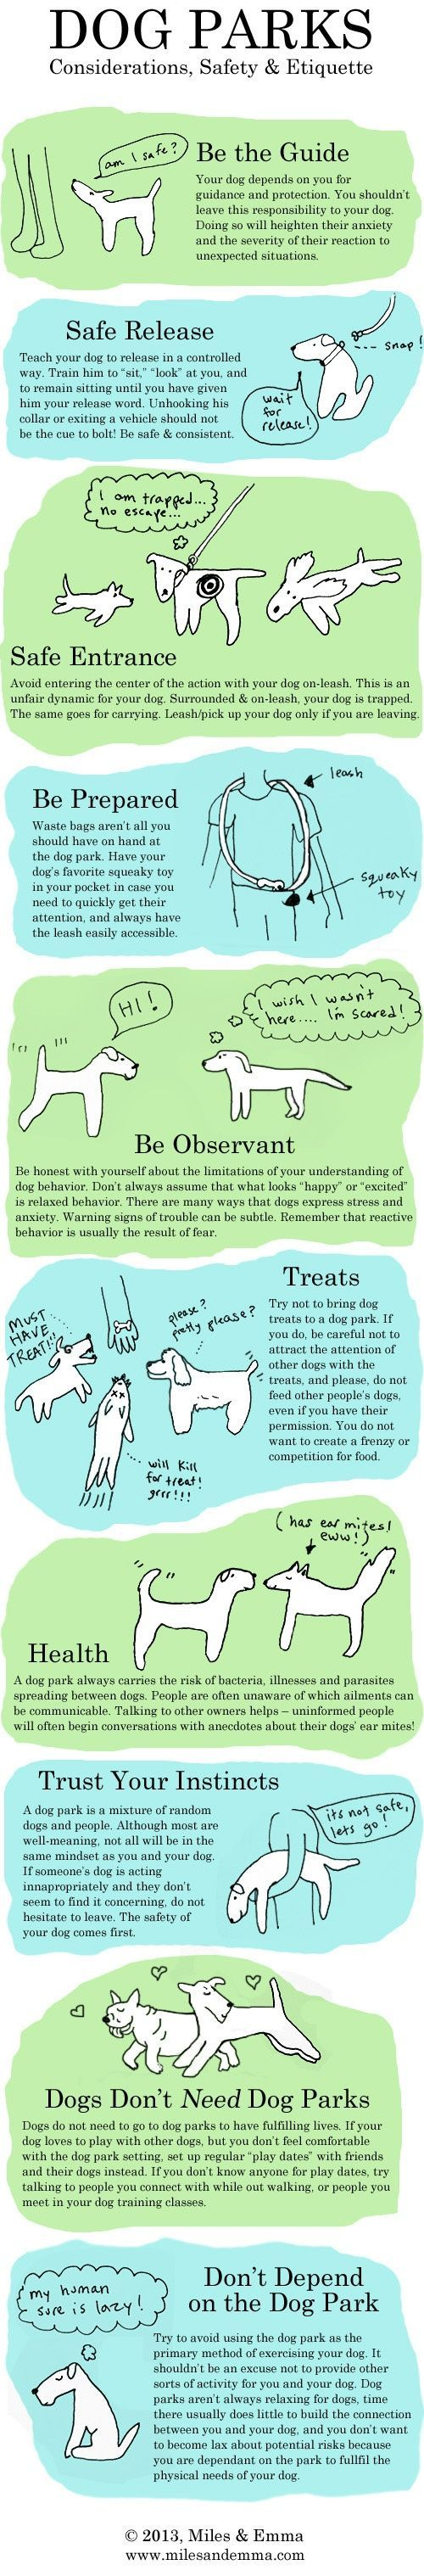 Dog Parks: Considerations, Safety & Etiquette. @KaufmannsPuppy